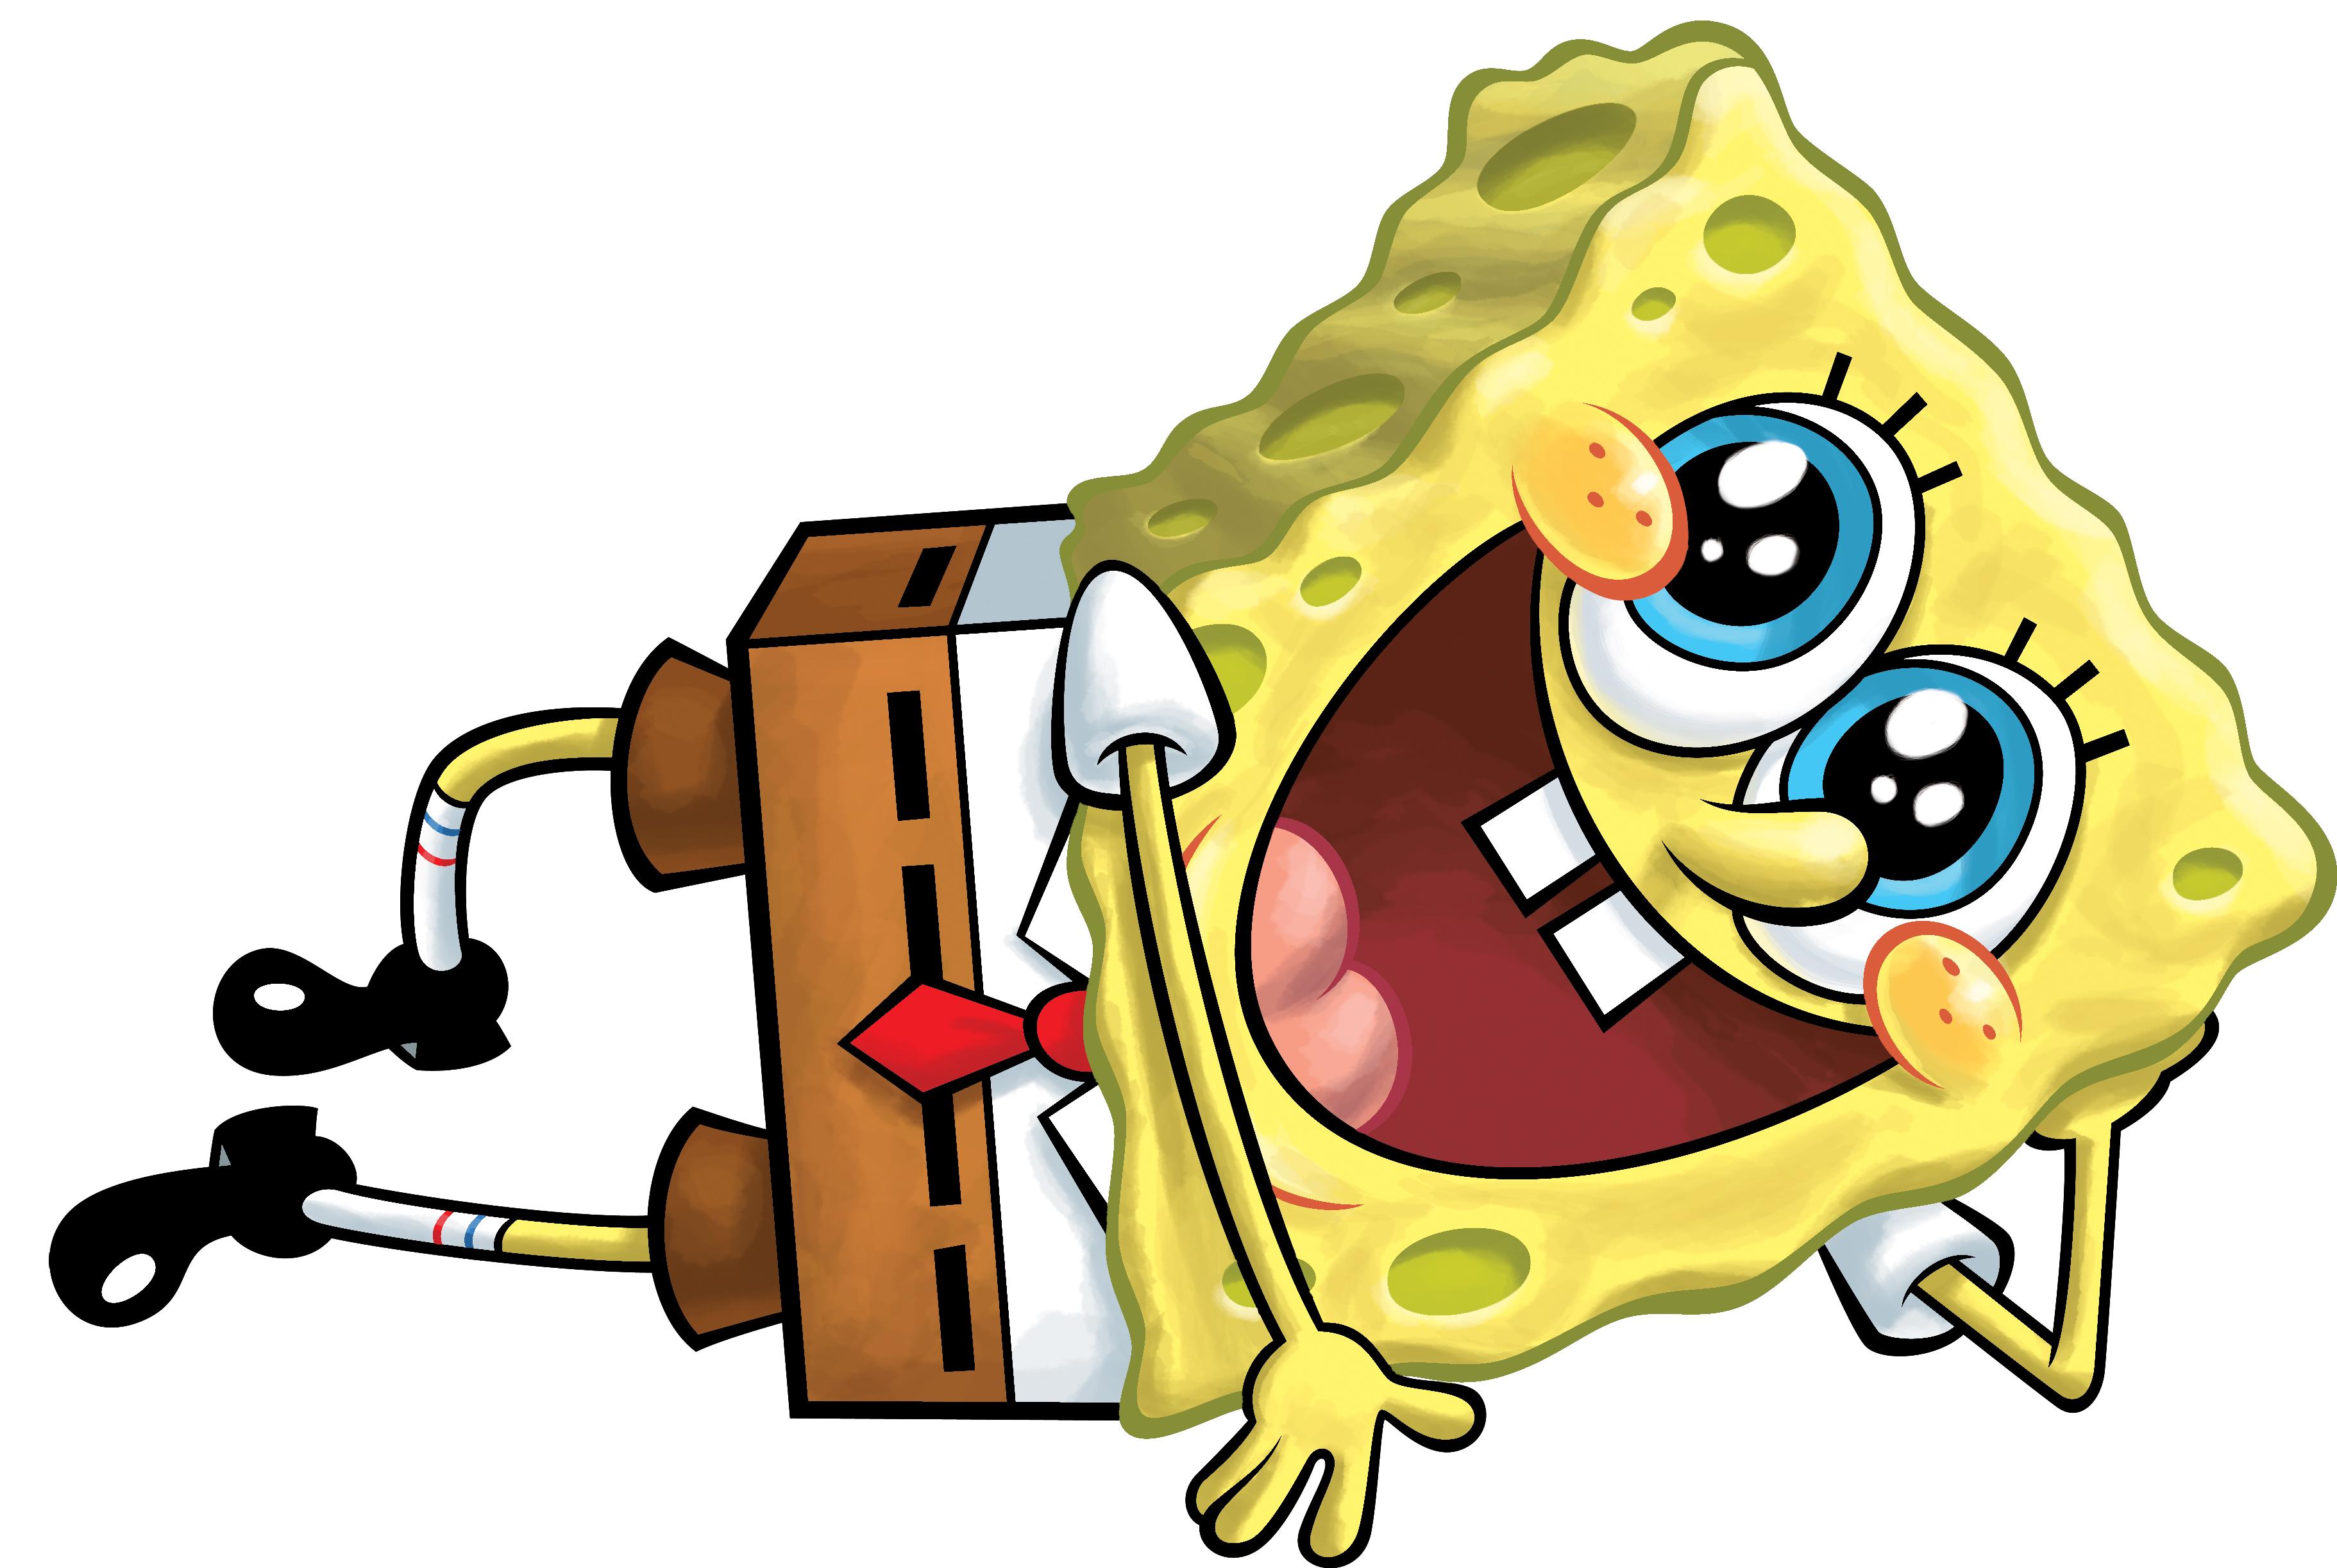 bild spongebob spongebob squarepants 33210754 3644 2445. Black Bedroom Furniture Sets. Home Design Ideas